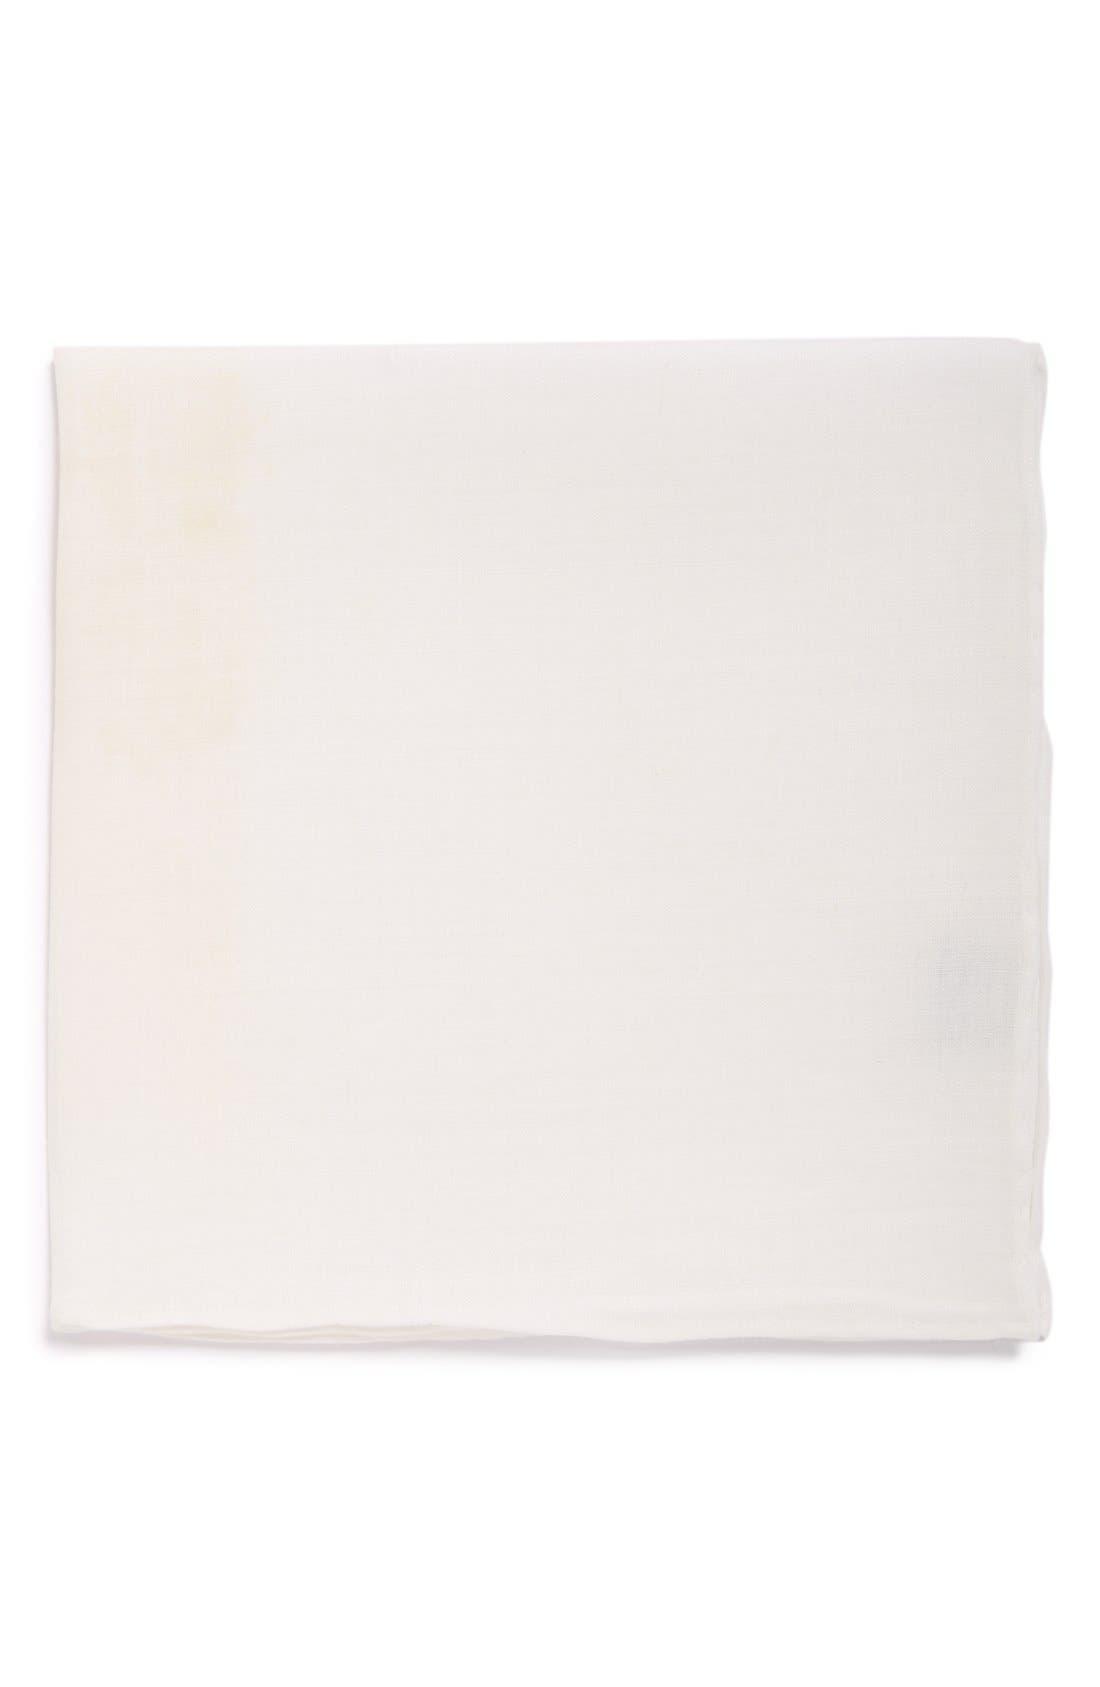 Solid Linen Pocket Square,                             Main thumbnail 1, color,